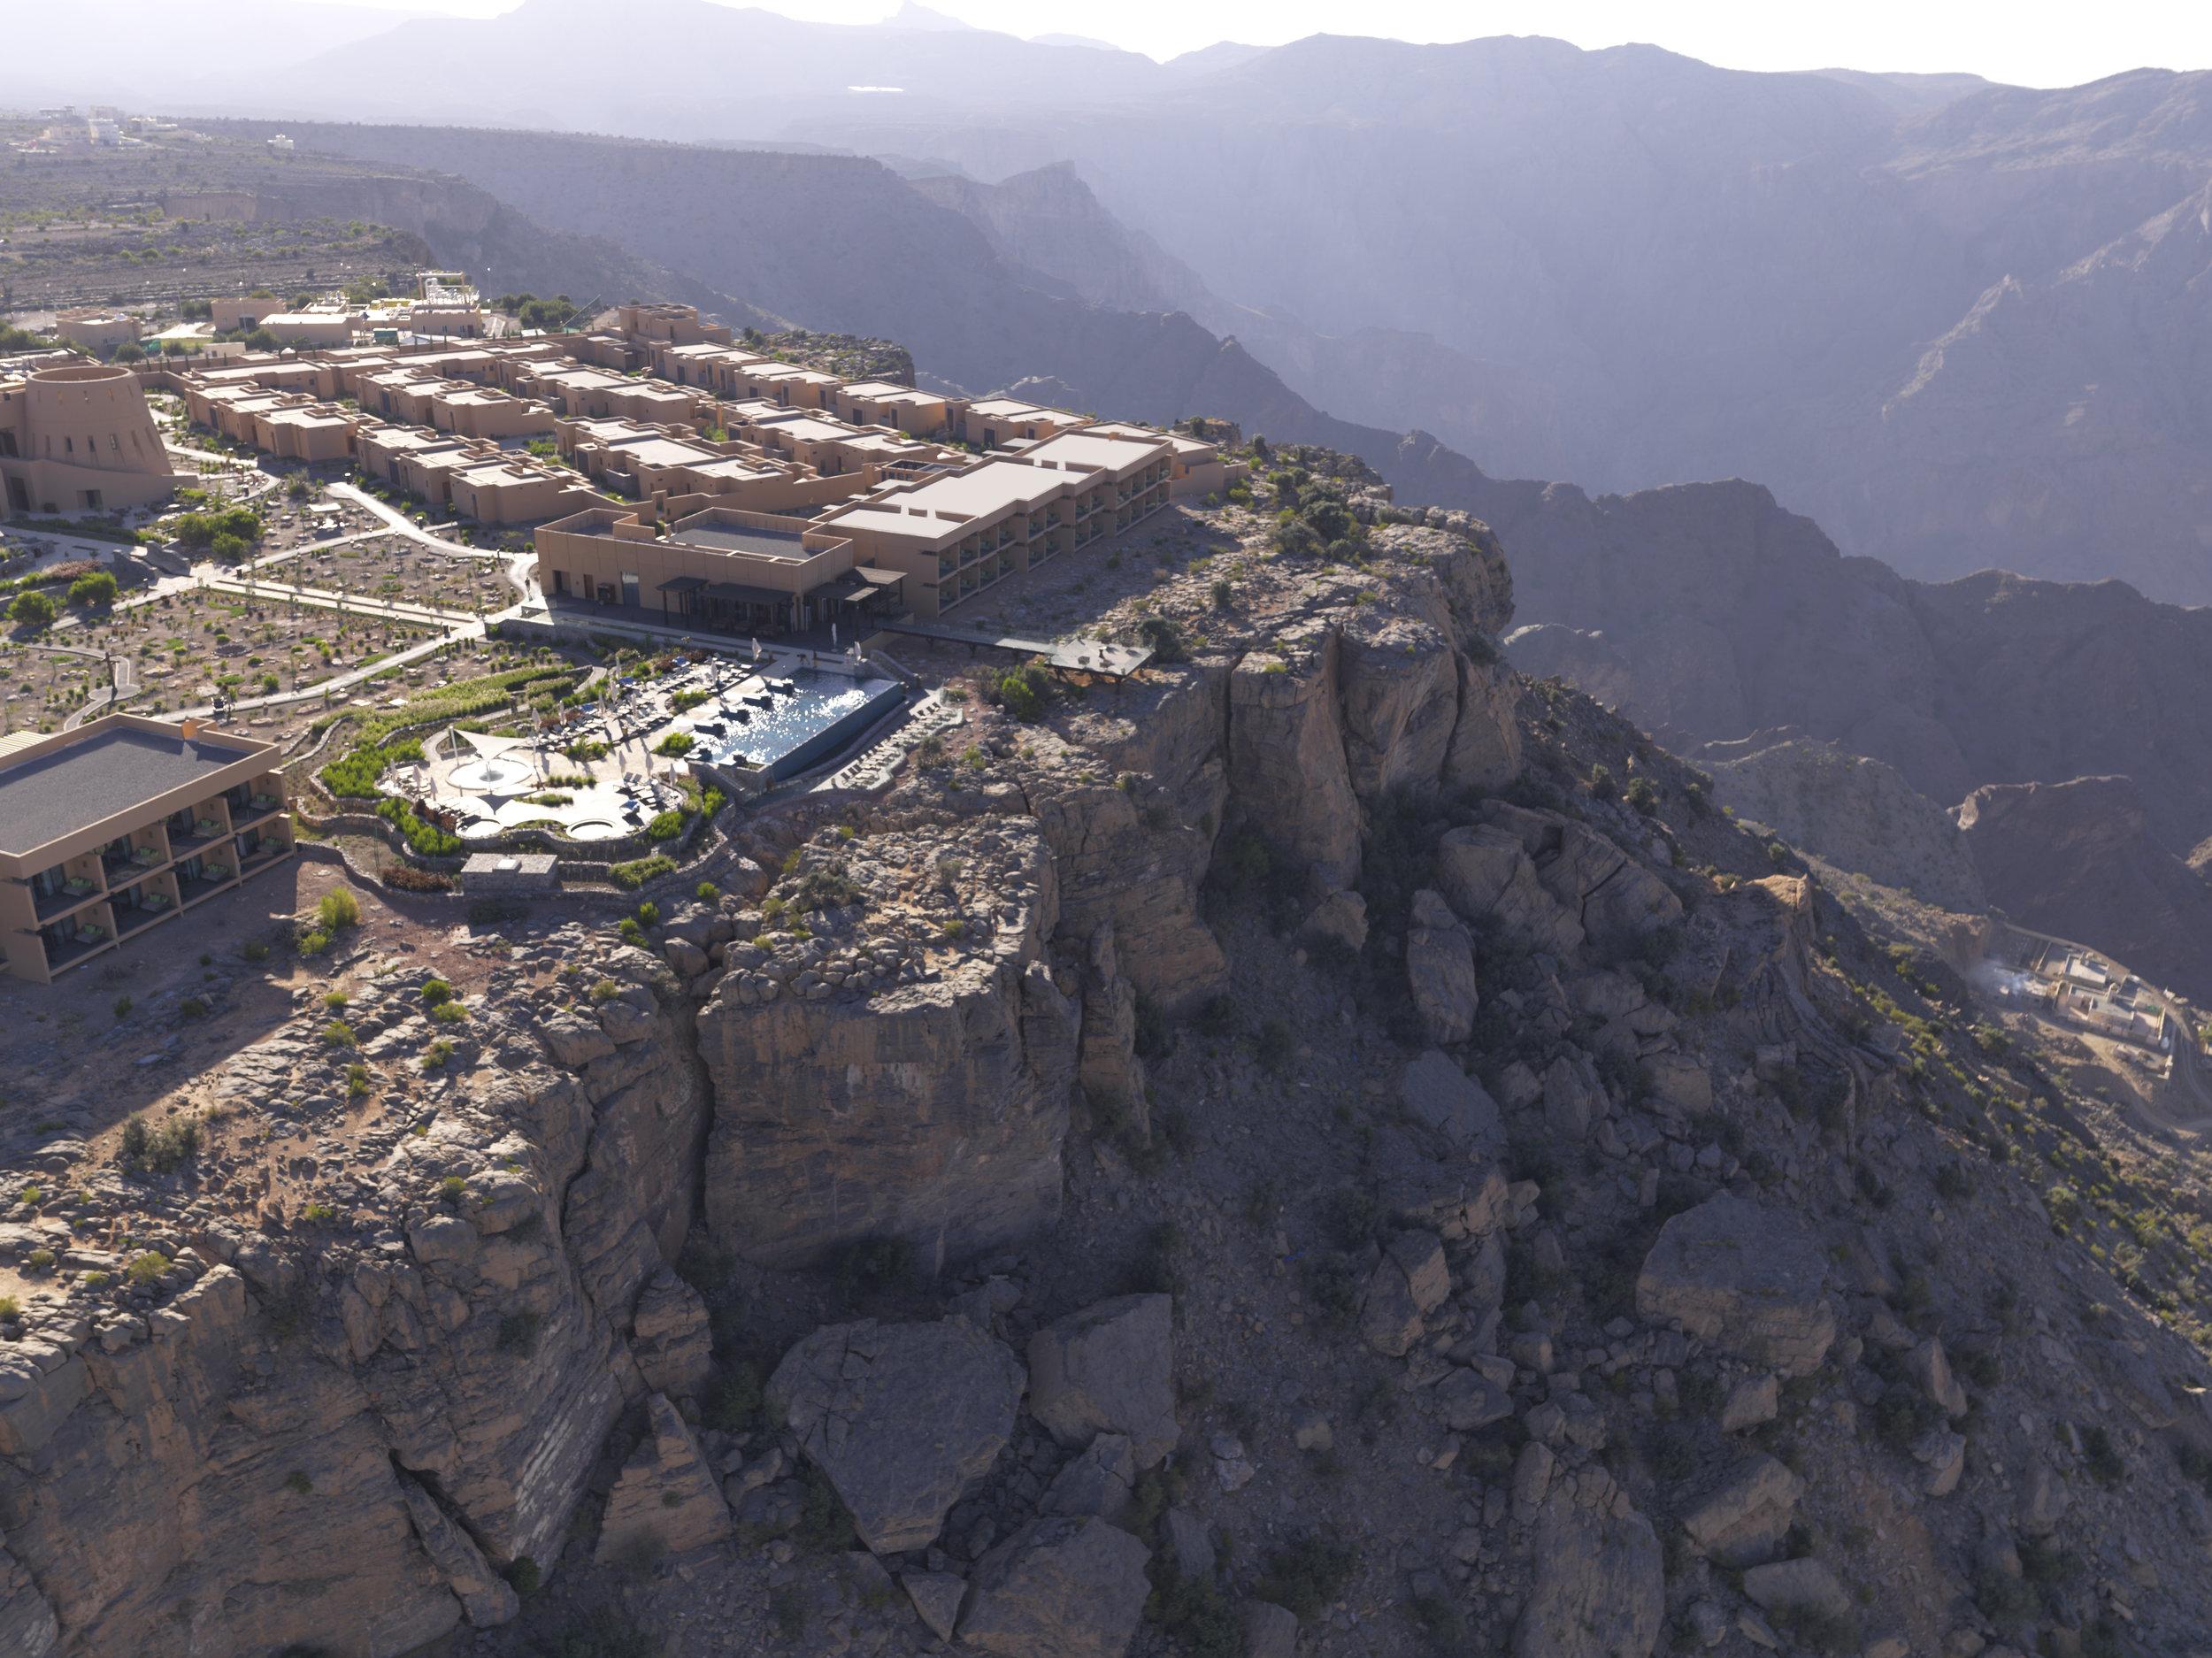 Anantara Al Jabal Al Akhdar Resort - Aerial 03.jpg